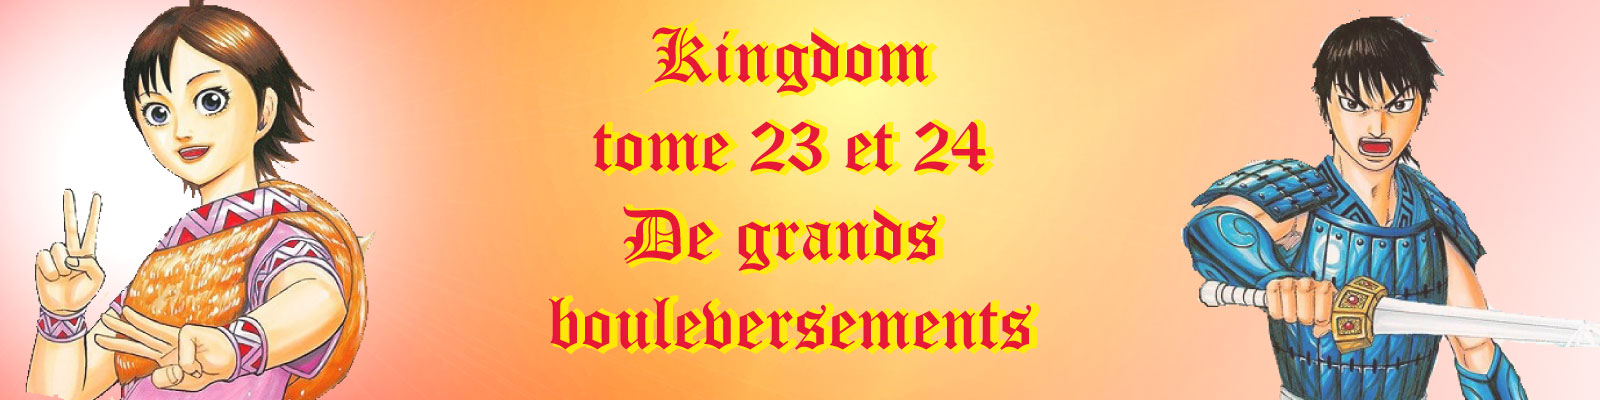 Kingdom 23 & 24